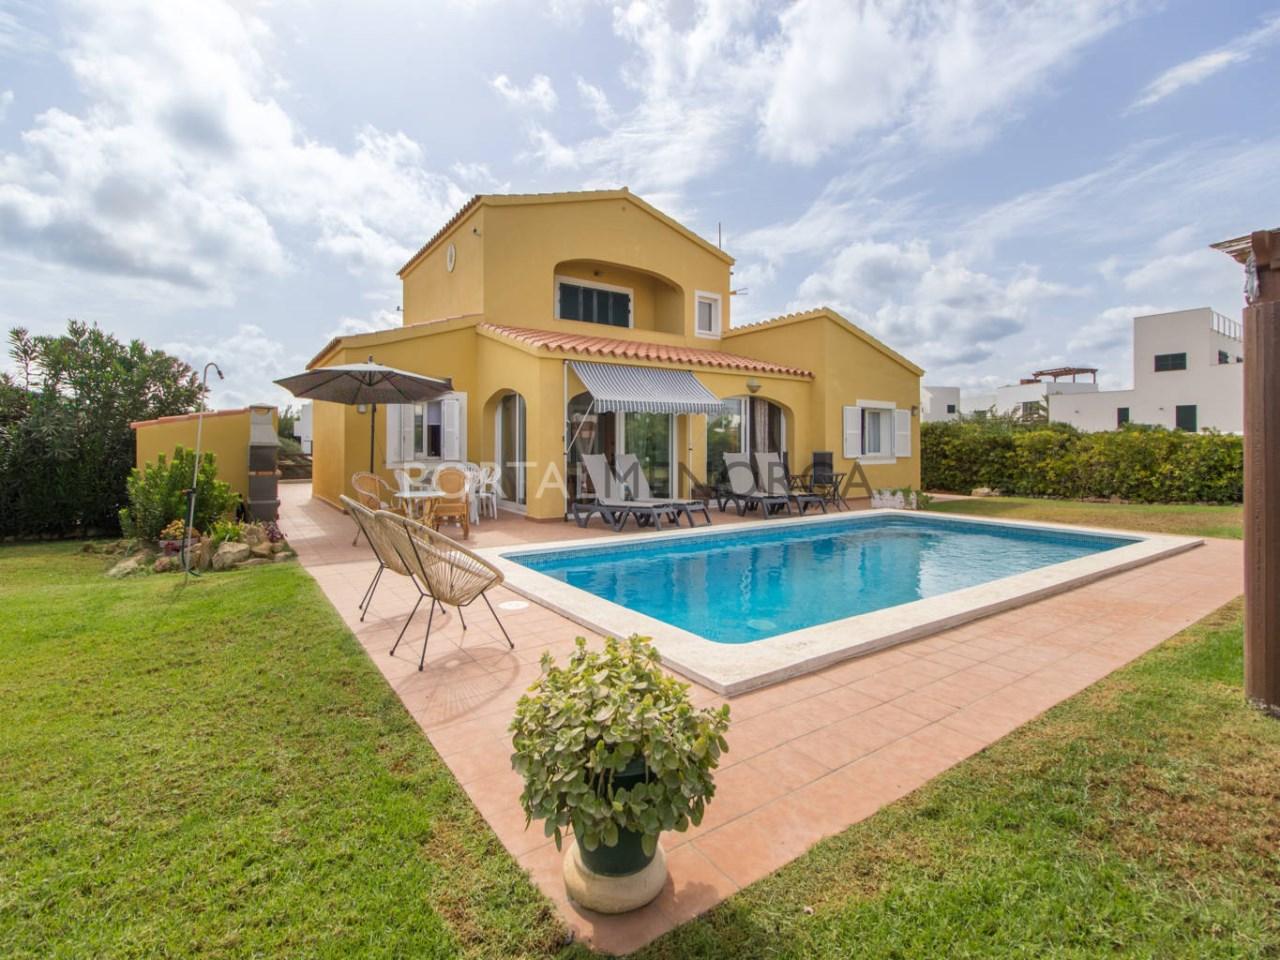 Chalet con piscina en venta en Punta Grossa